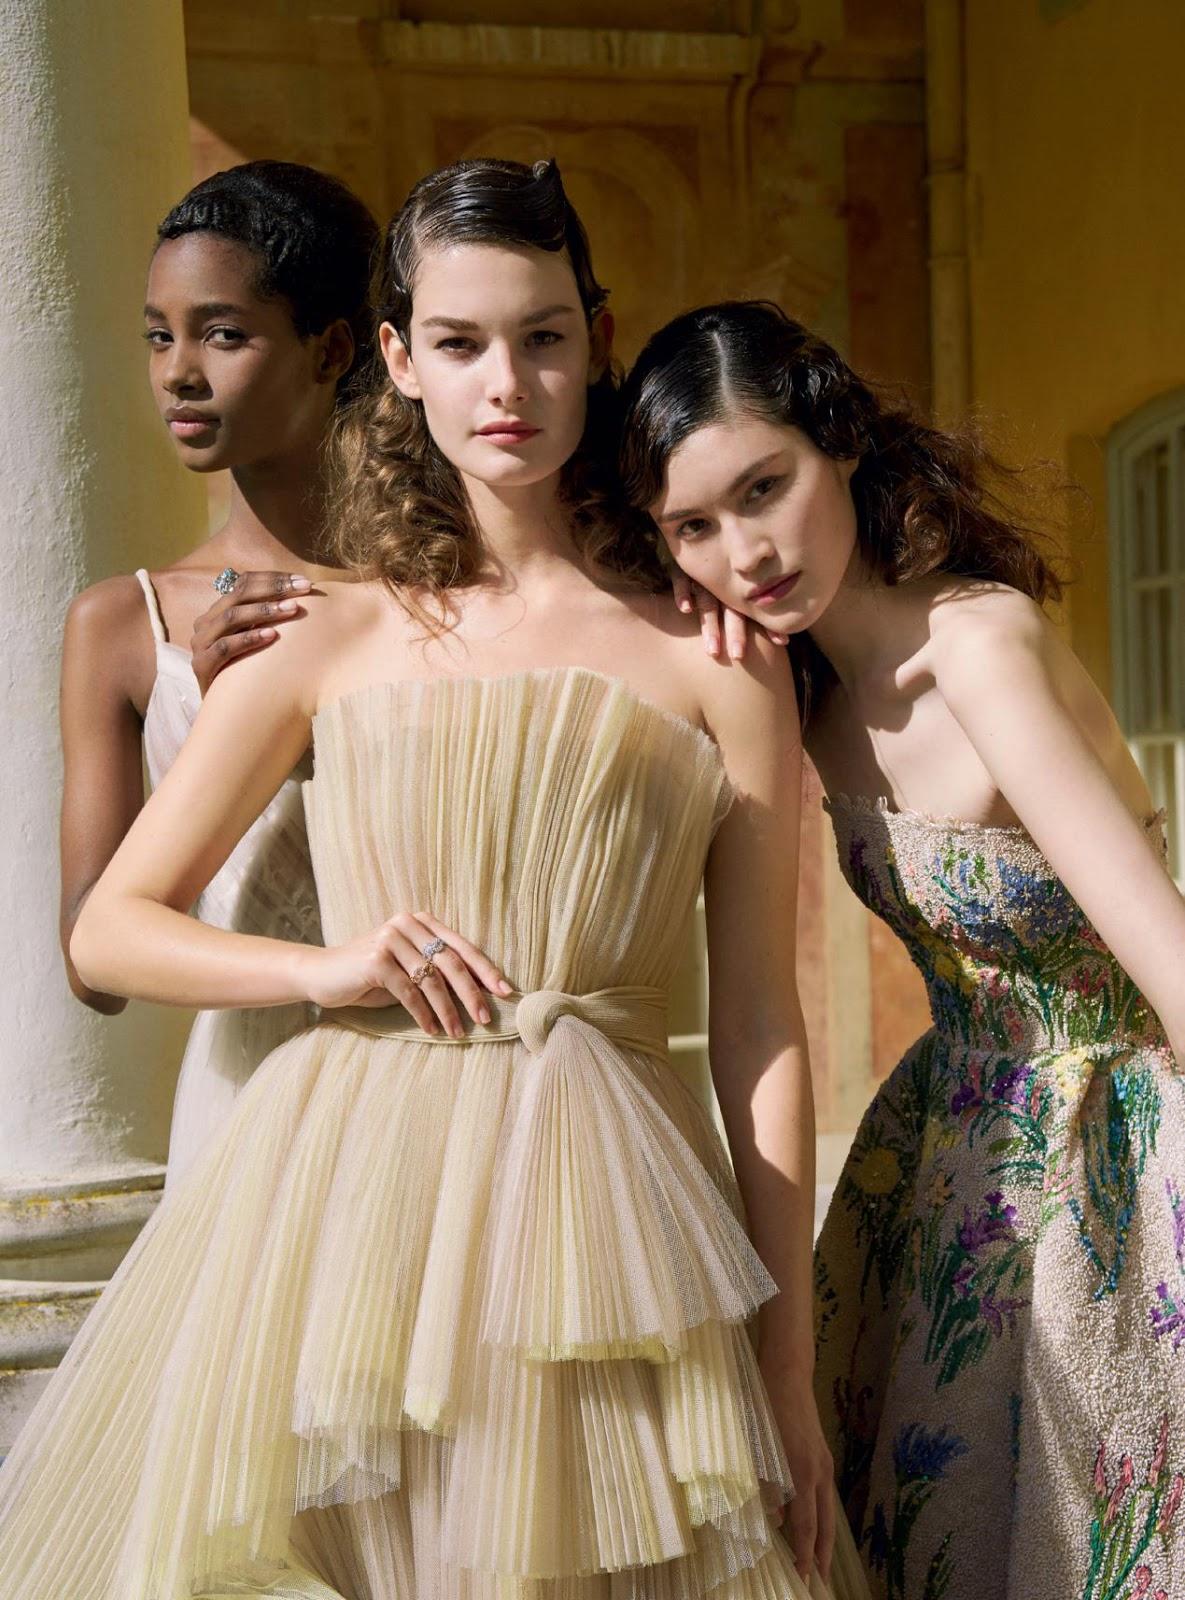 Harper's Bazaar UK June 2017 / модели Tami Williams, Ophelie Guillermand, Sui He / фотограф Erik Madigan Heck